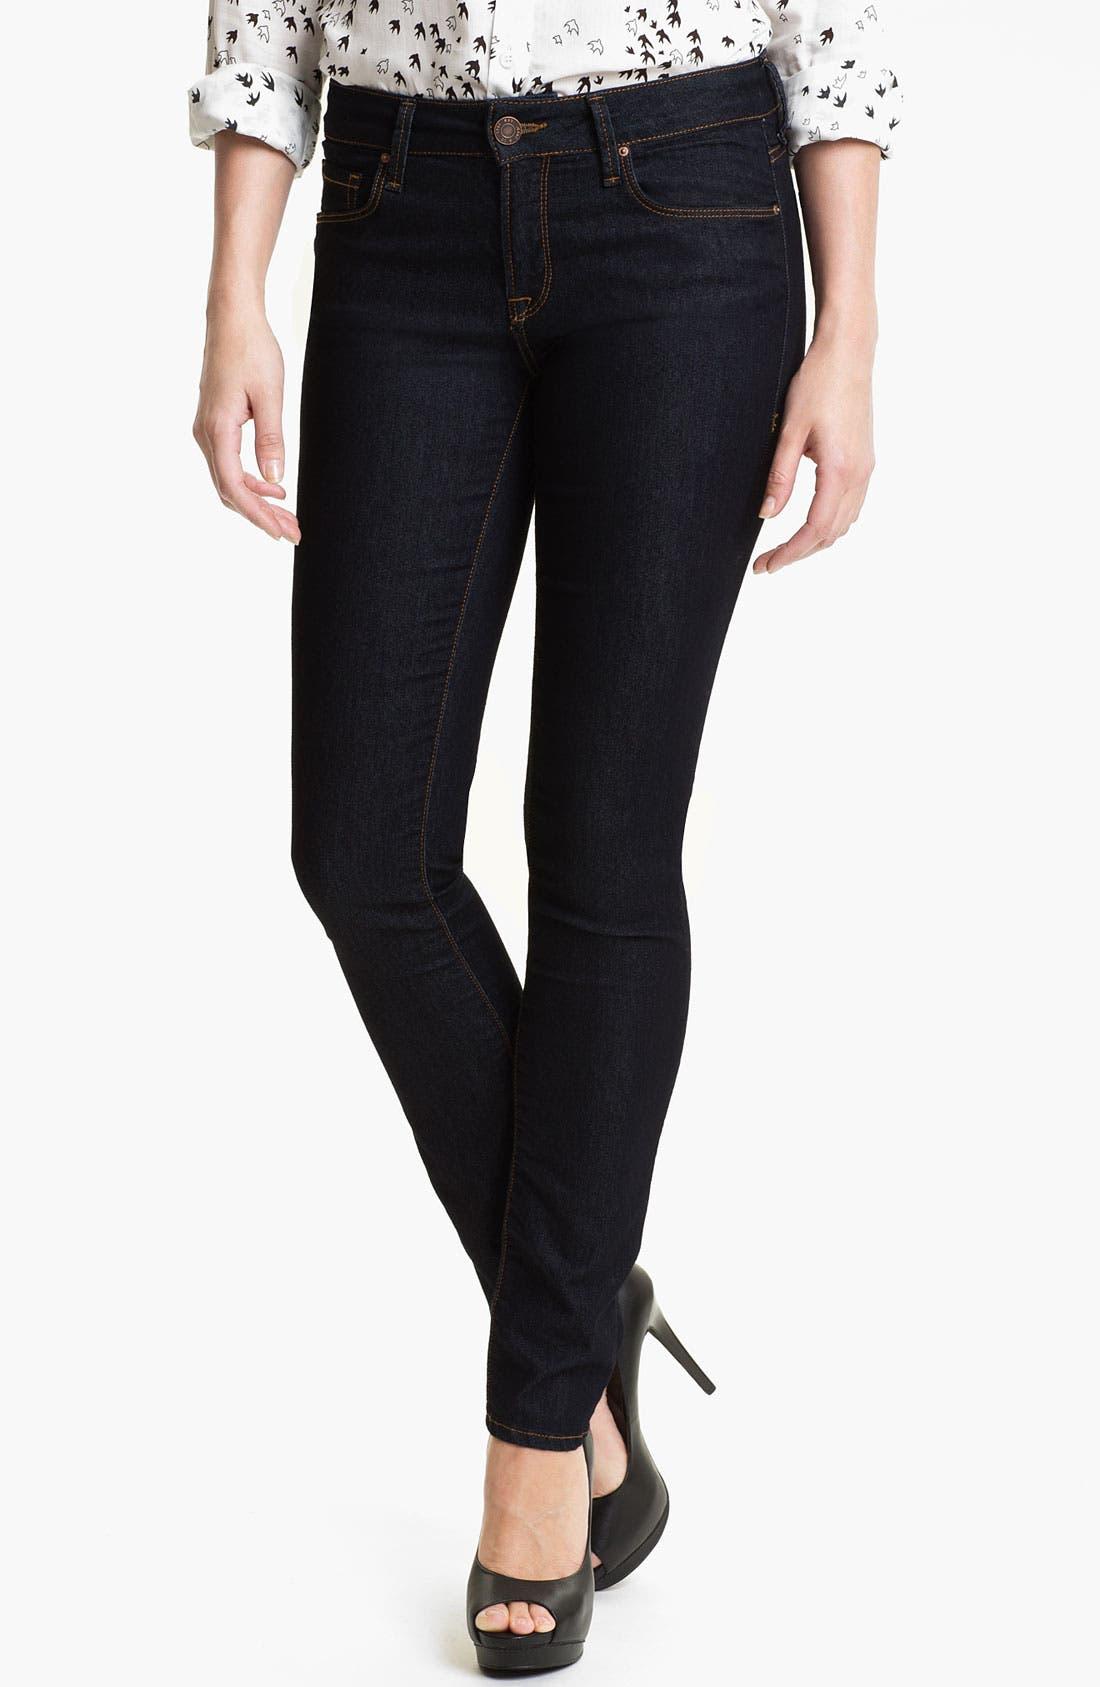 Main Image - Mavi Jeans 'Alexa' Mid Rise Super Skinny Jeans (Rinse Super)